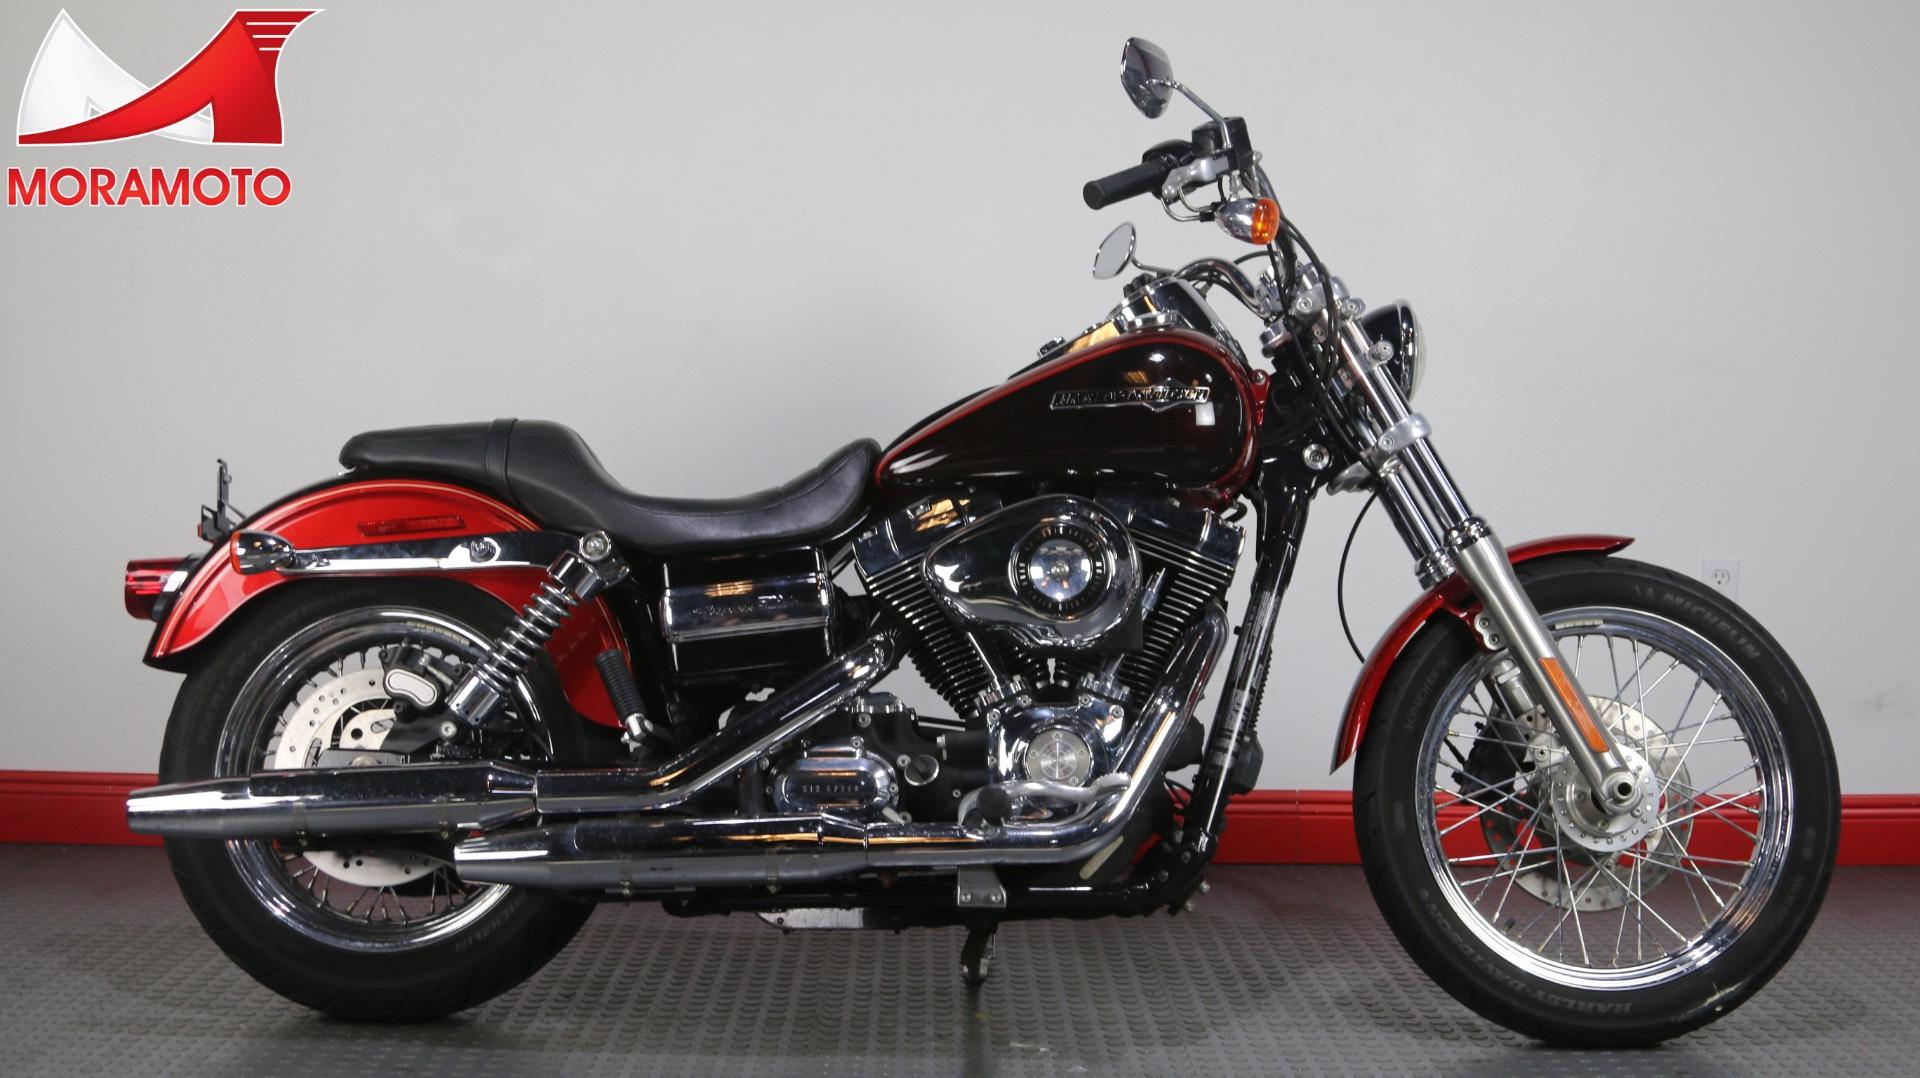 2012 Harley-Davidson Dyna® Wide Glide® in Tampa, Florida